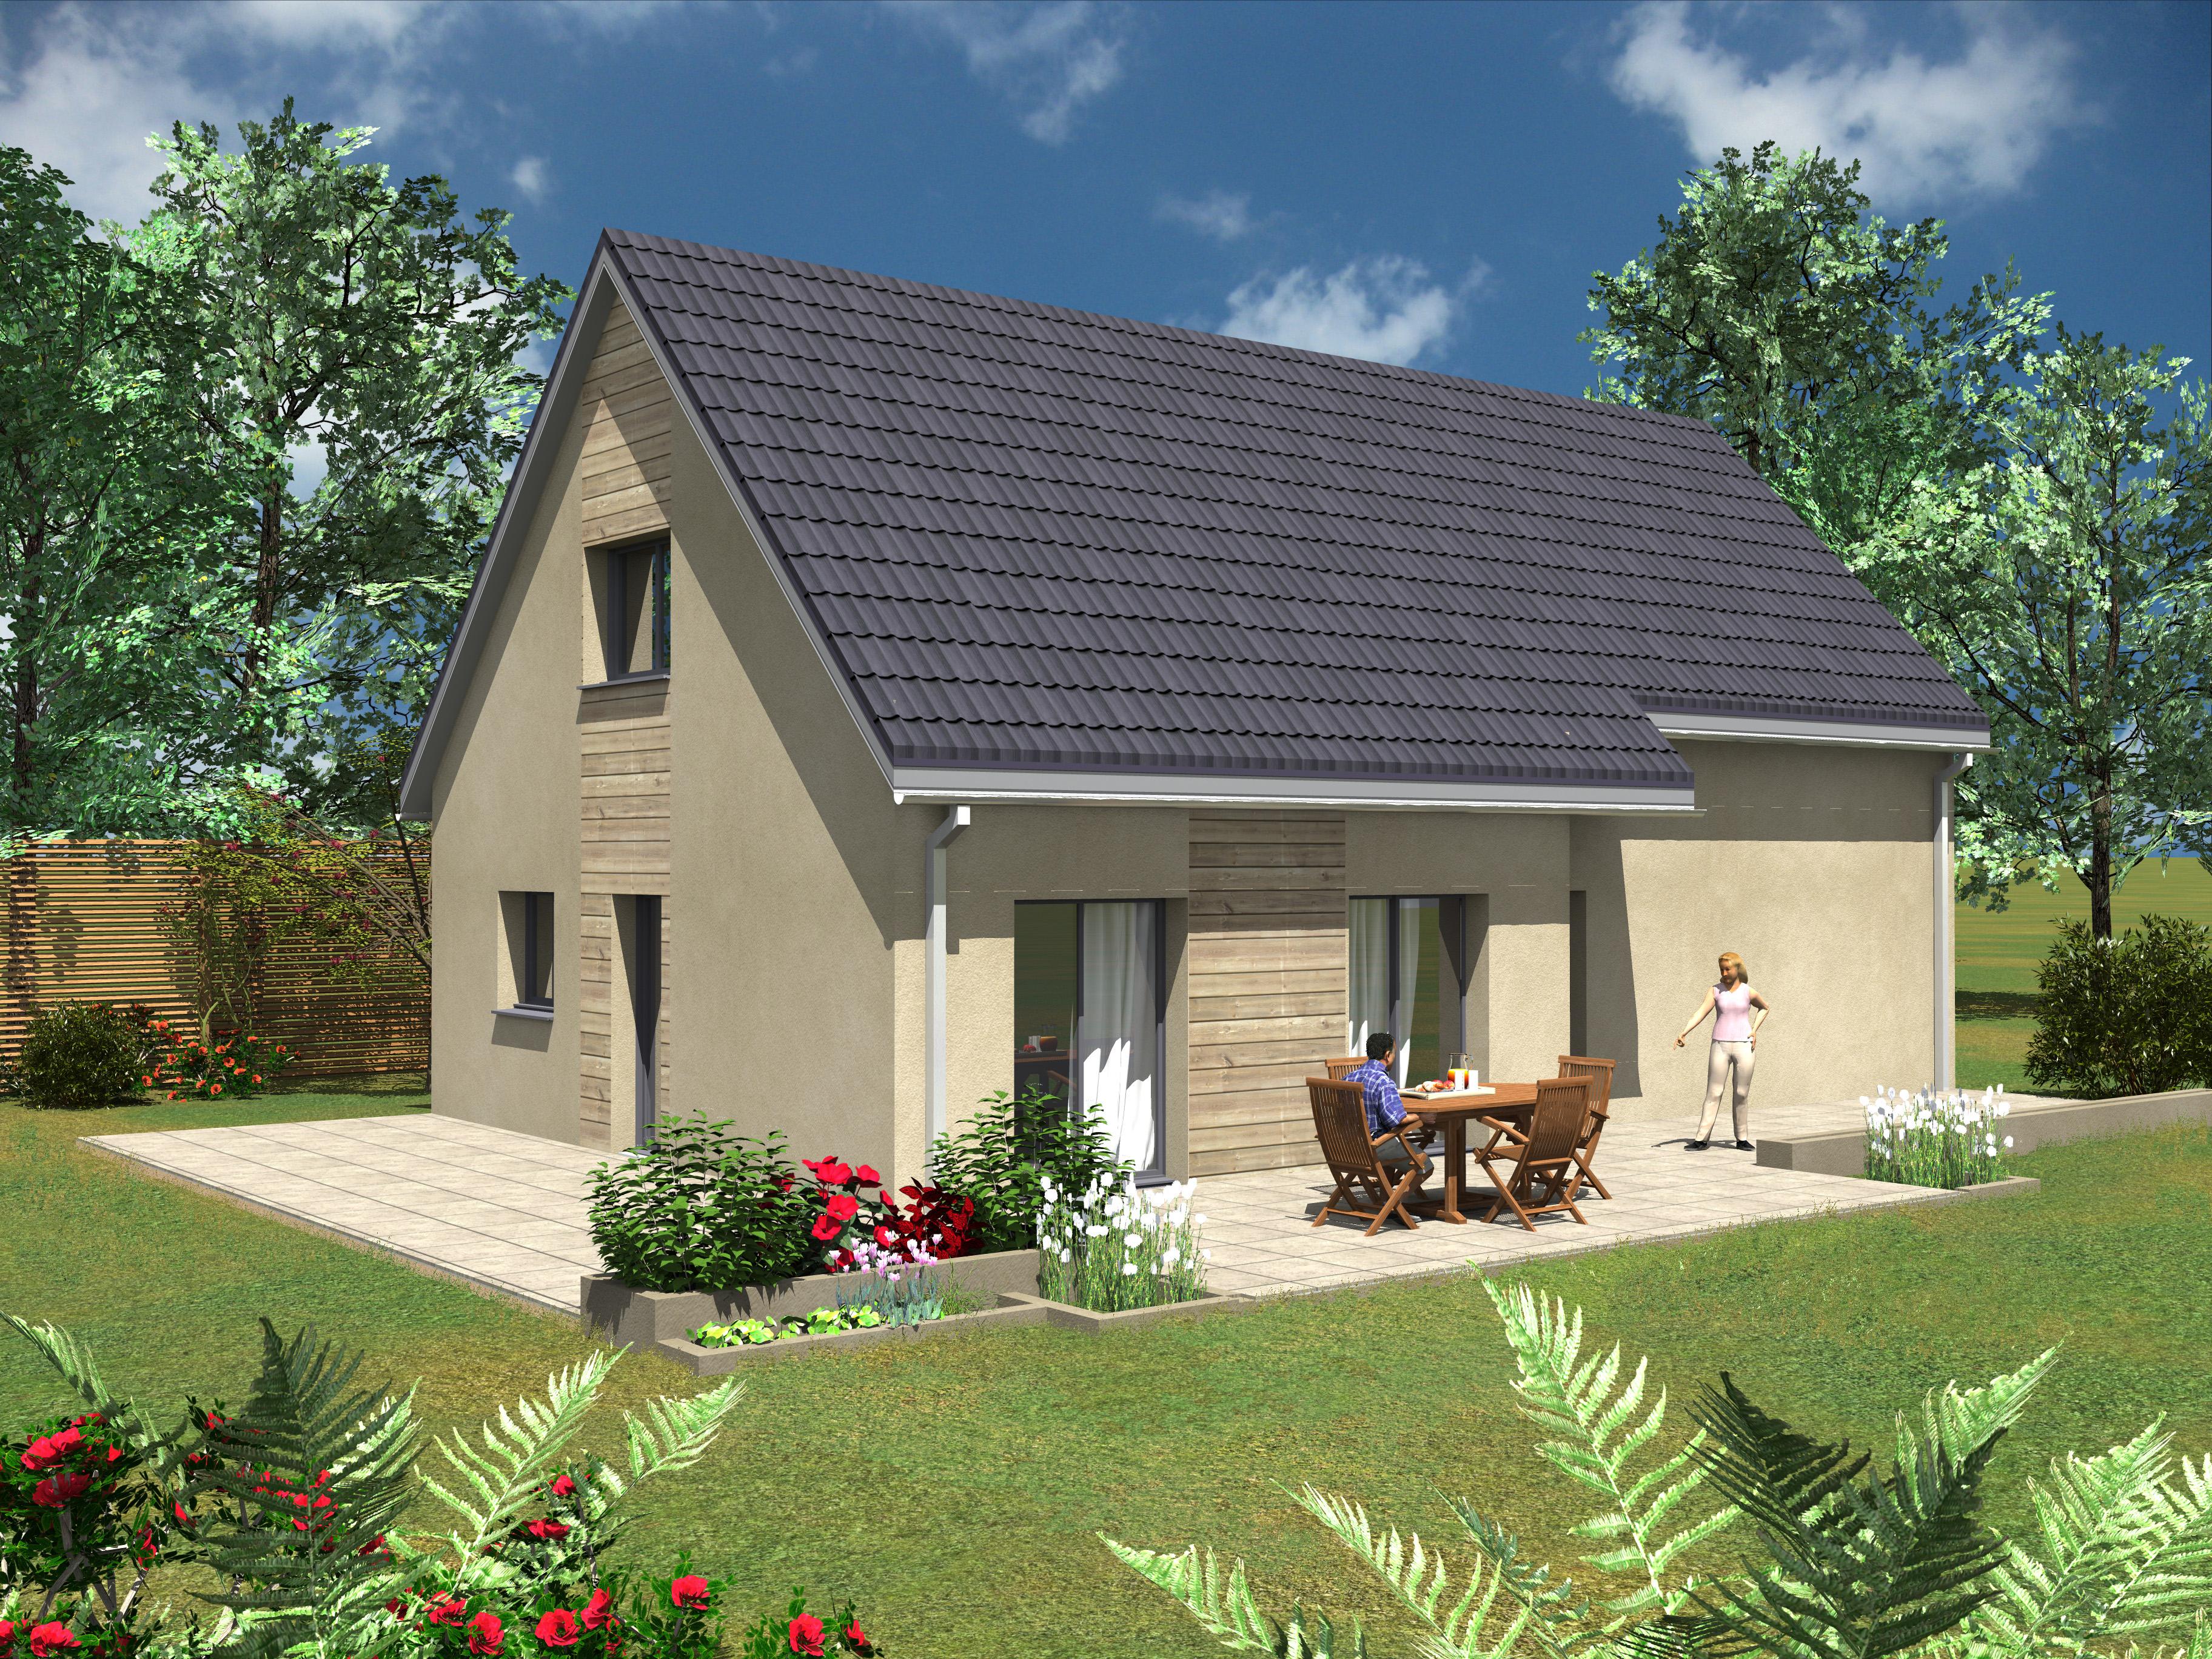 esprit traditionnel 14 habitat poulingue. Black Bedroom Furniture Sets. Home Design Ideas